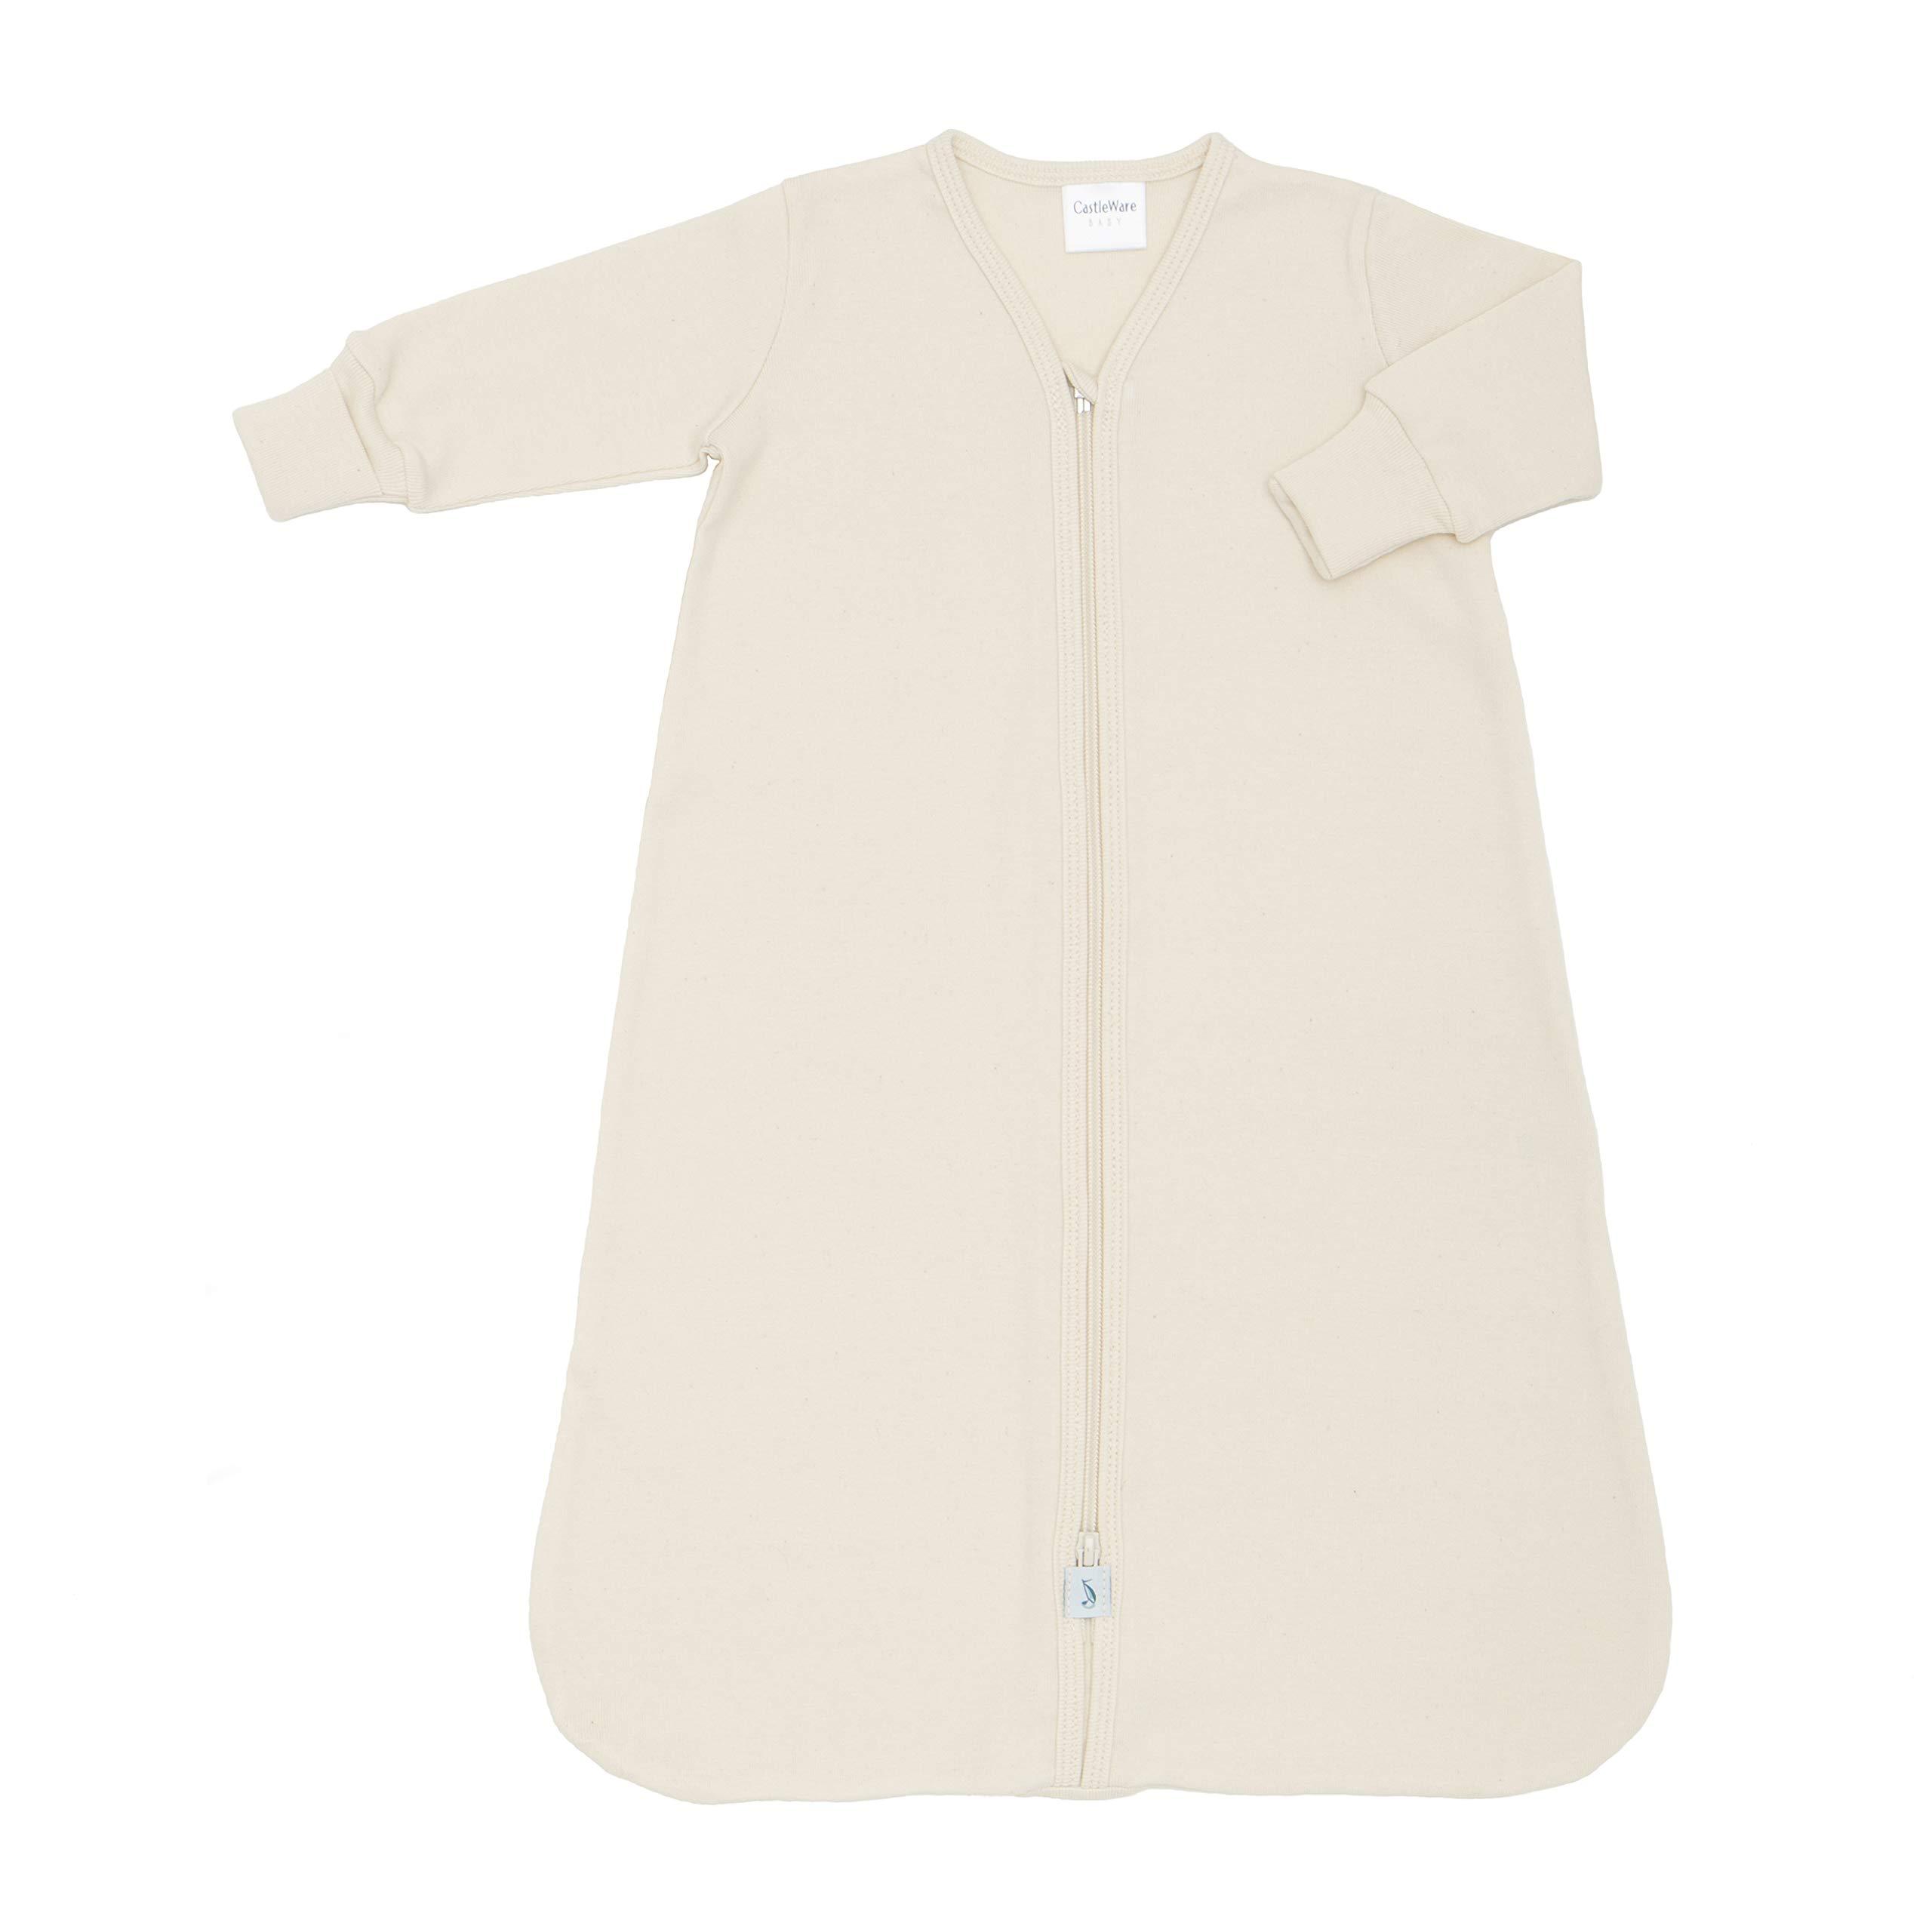 CastleWare Baby- Organic Cotton Rib Knit- Sleeper Bag- Long Sleeve- Newborn-4 Years (4, Natural)